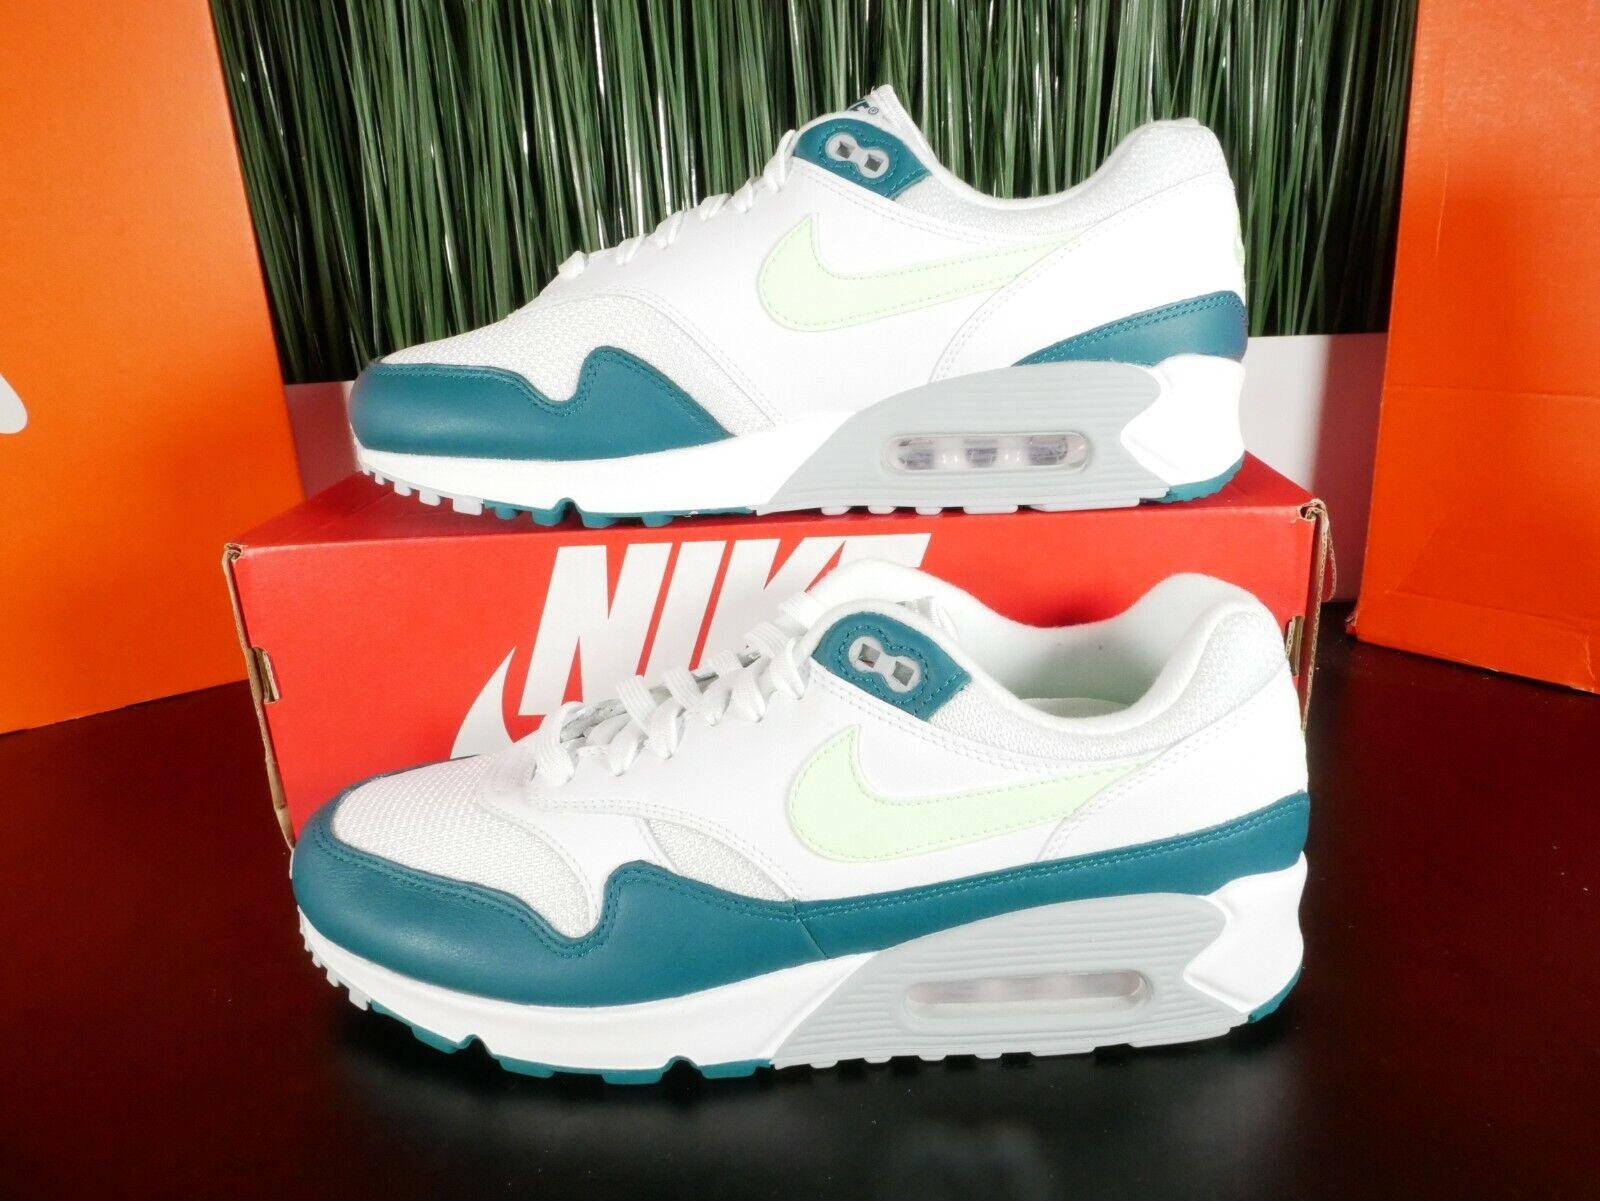 Mens Nike Air Max 1 FB QS Size 10.5 Shoes 744491 001 Black White